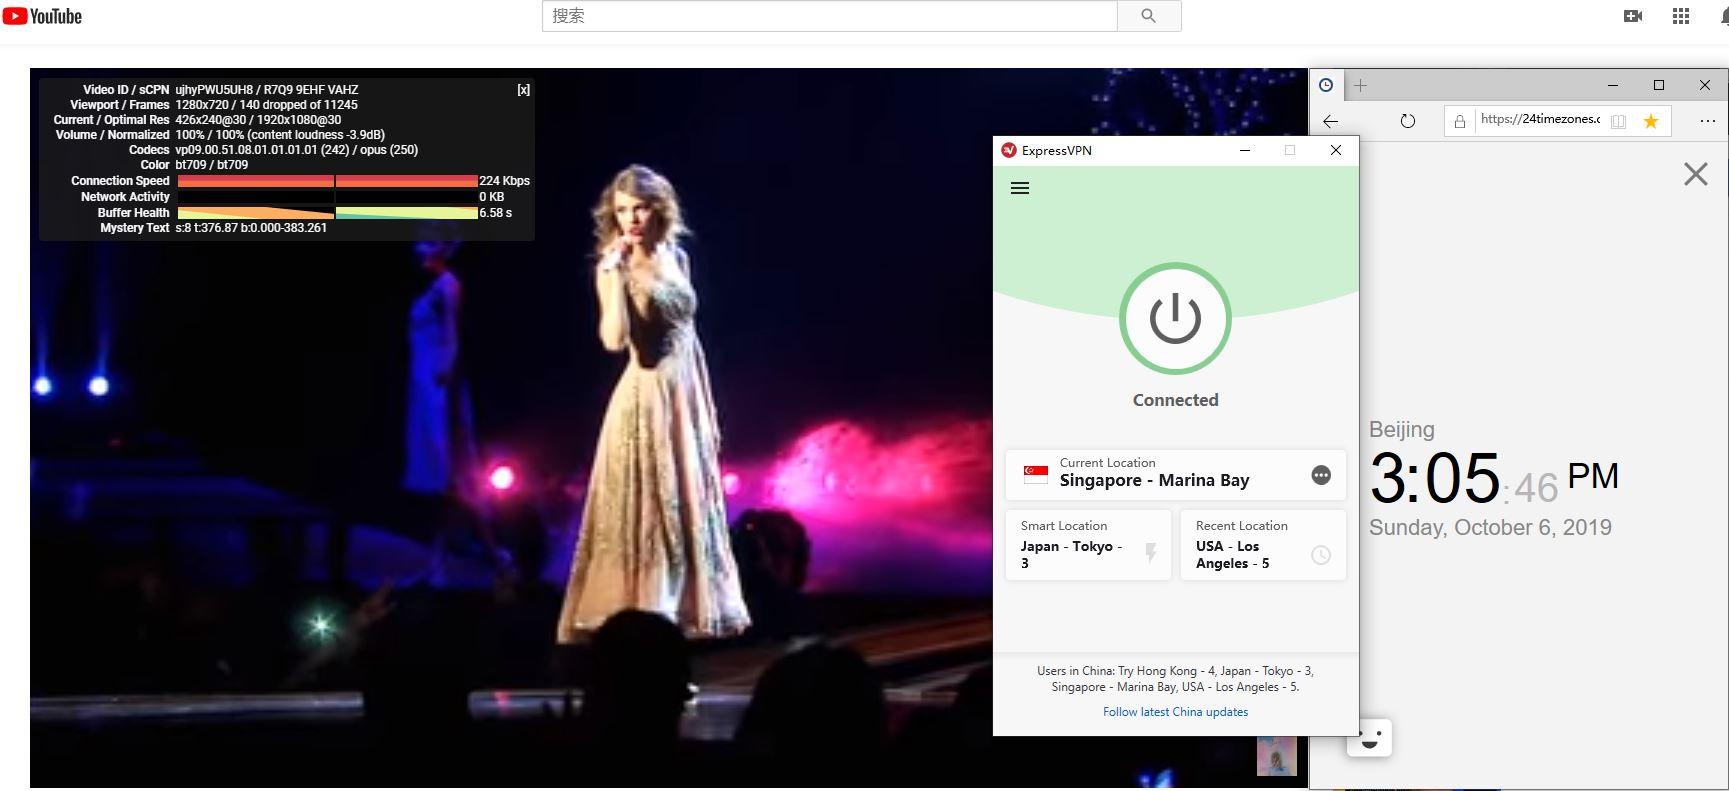 Windows ExpressVPN Singapore - Marina Bay 中国VPN翻墙 科学上网 YouTube测速-20191006